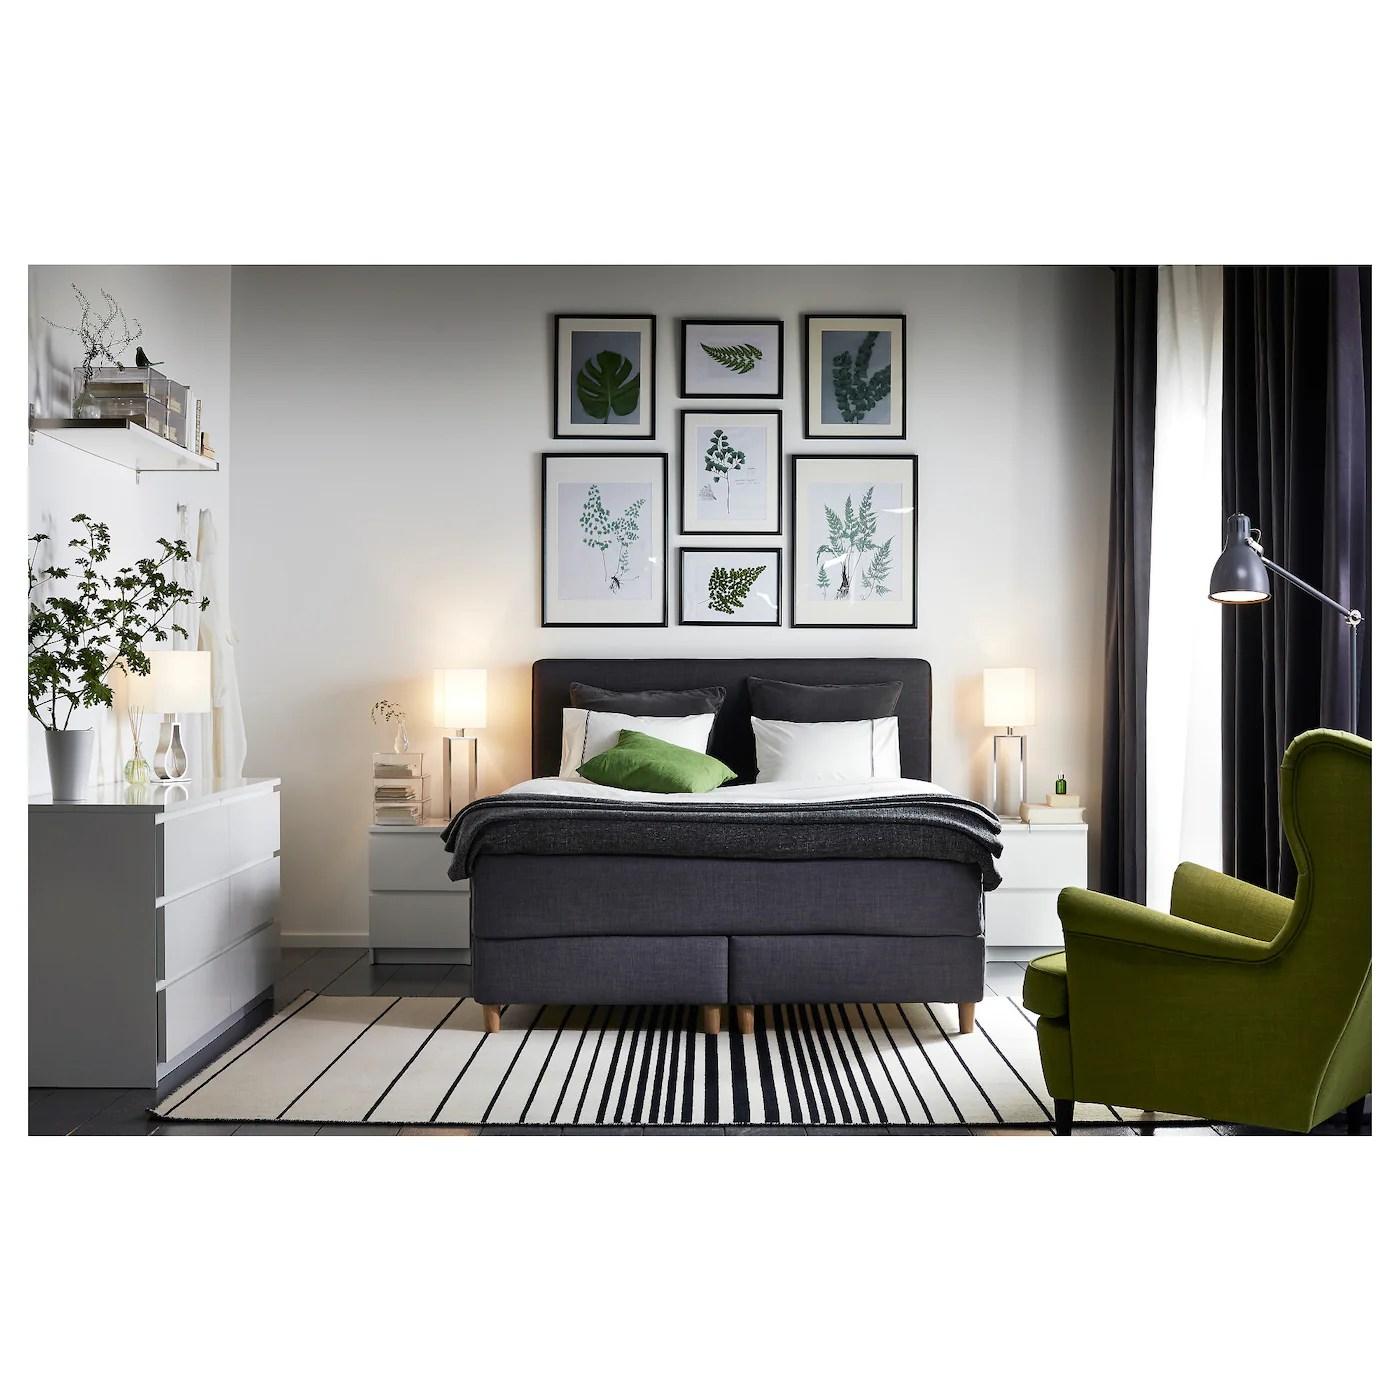 MALM Commode 2 Tiroirs Blanc 40 X 55 Cm IKEA